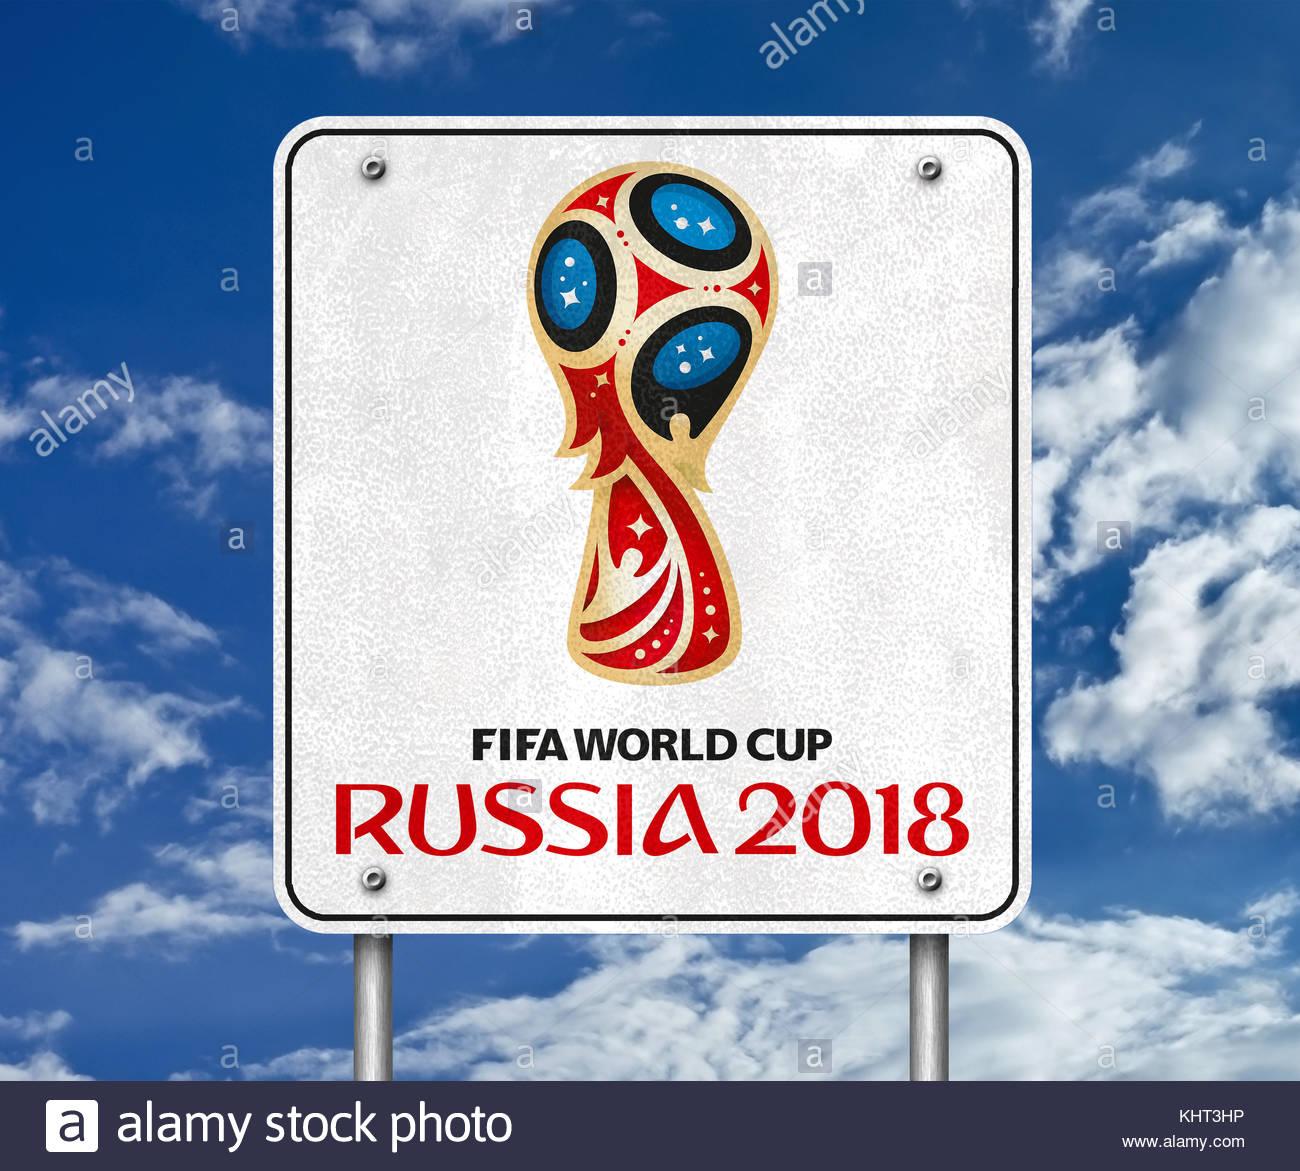 FIFA World Cup 2018 Russia logo icon - Stock Image